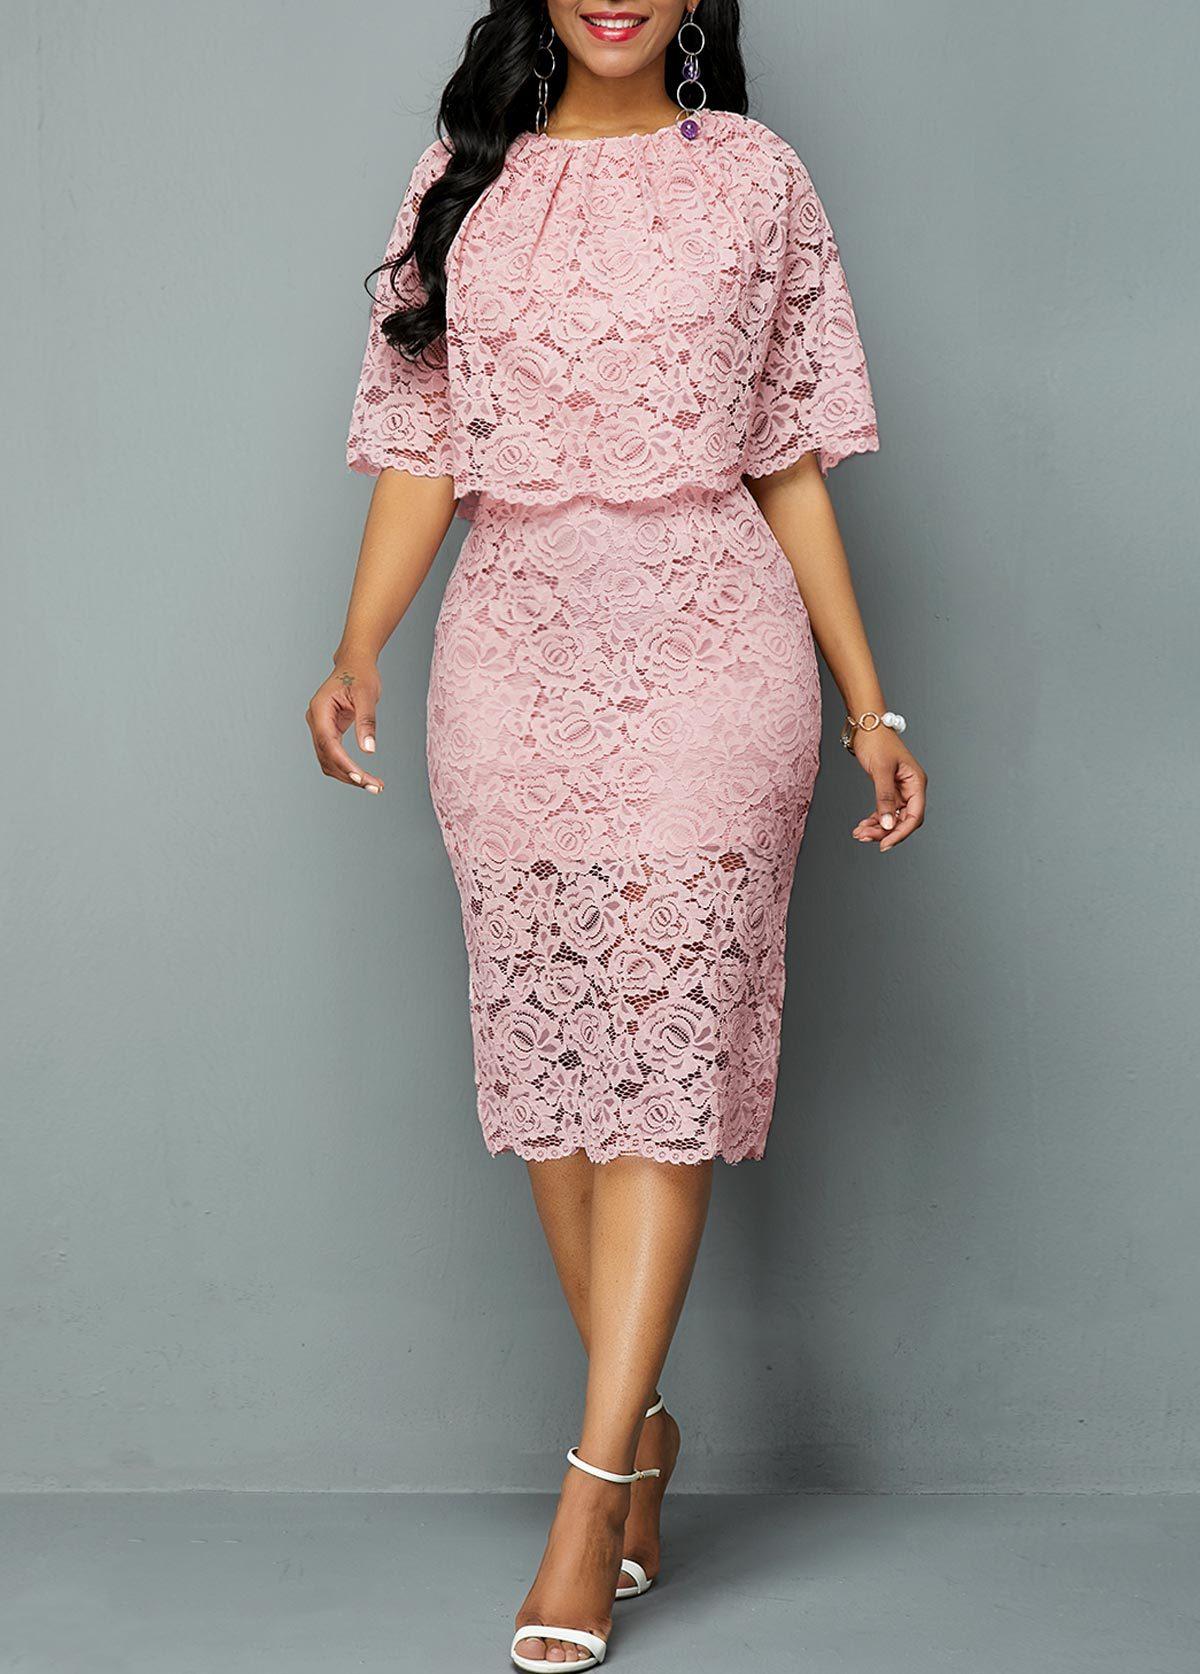 Large Size Dress Round Neck Lace Cutout Dress Female Elegant Five-point Sleeves Slim Party Large Size Dress Female Vestidos 5xl